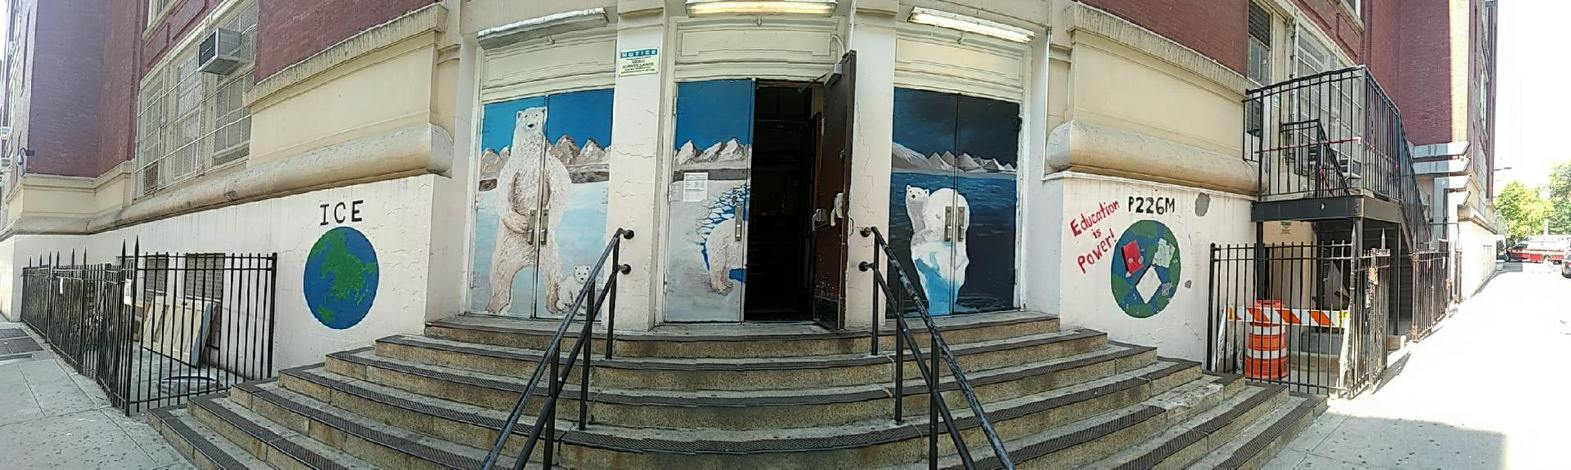 ICE Entrance.jpg